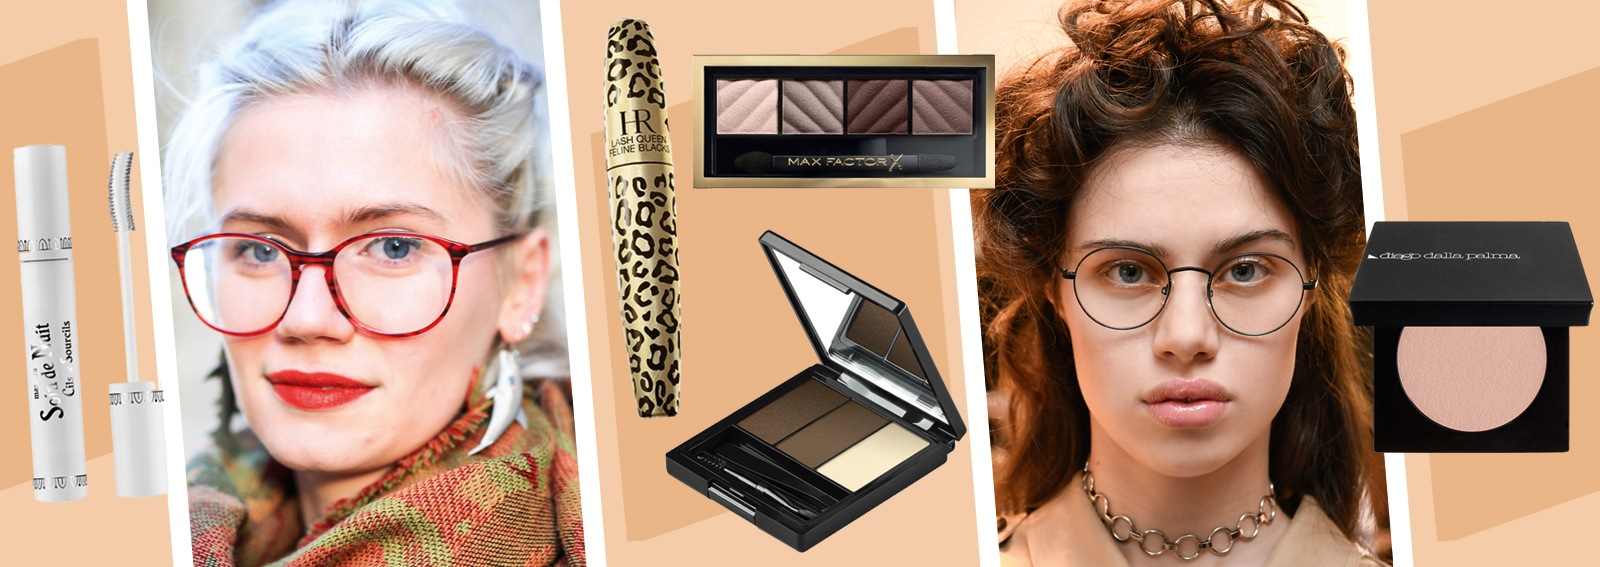 DESKTOP_makeup_occhiali